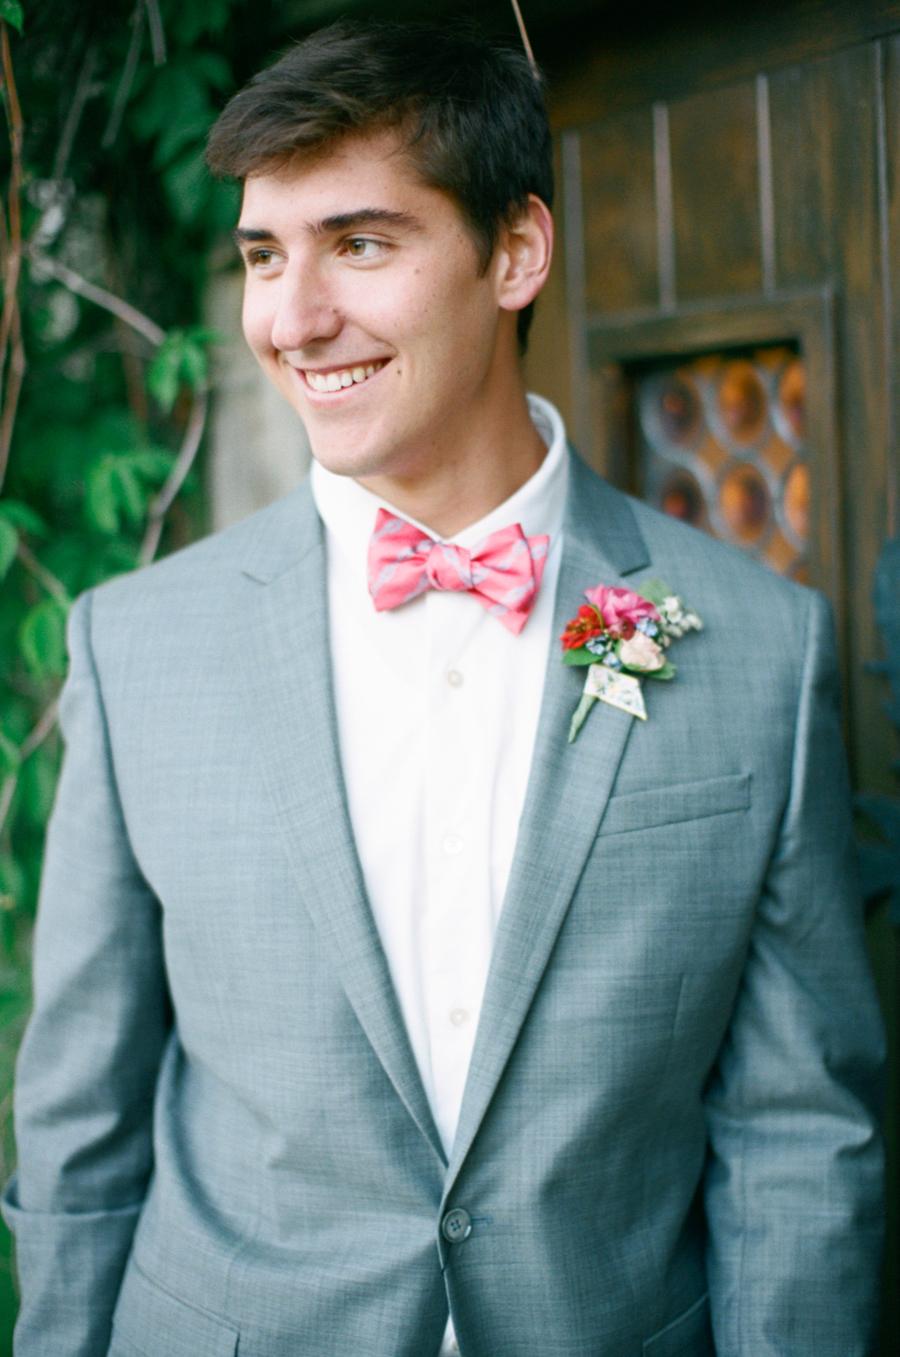 Groom in Pink Bow Tie - Elizabeth Anne Designs: The Wedding Blog